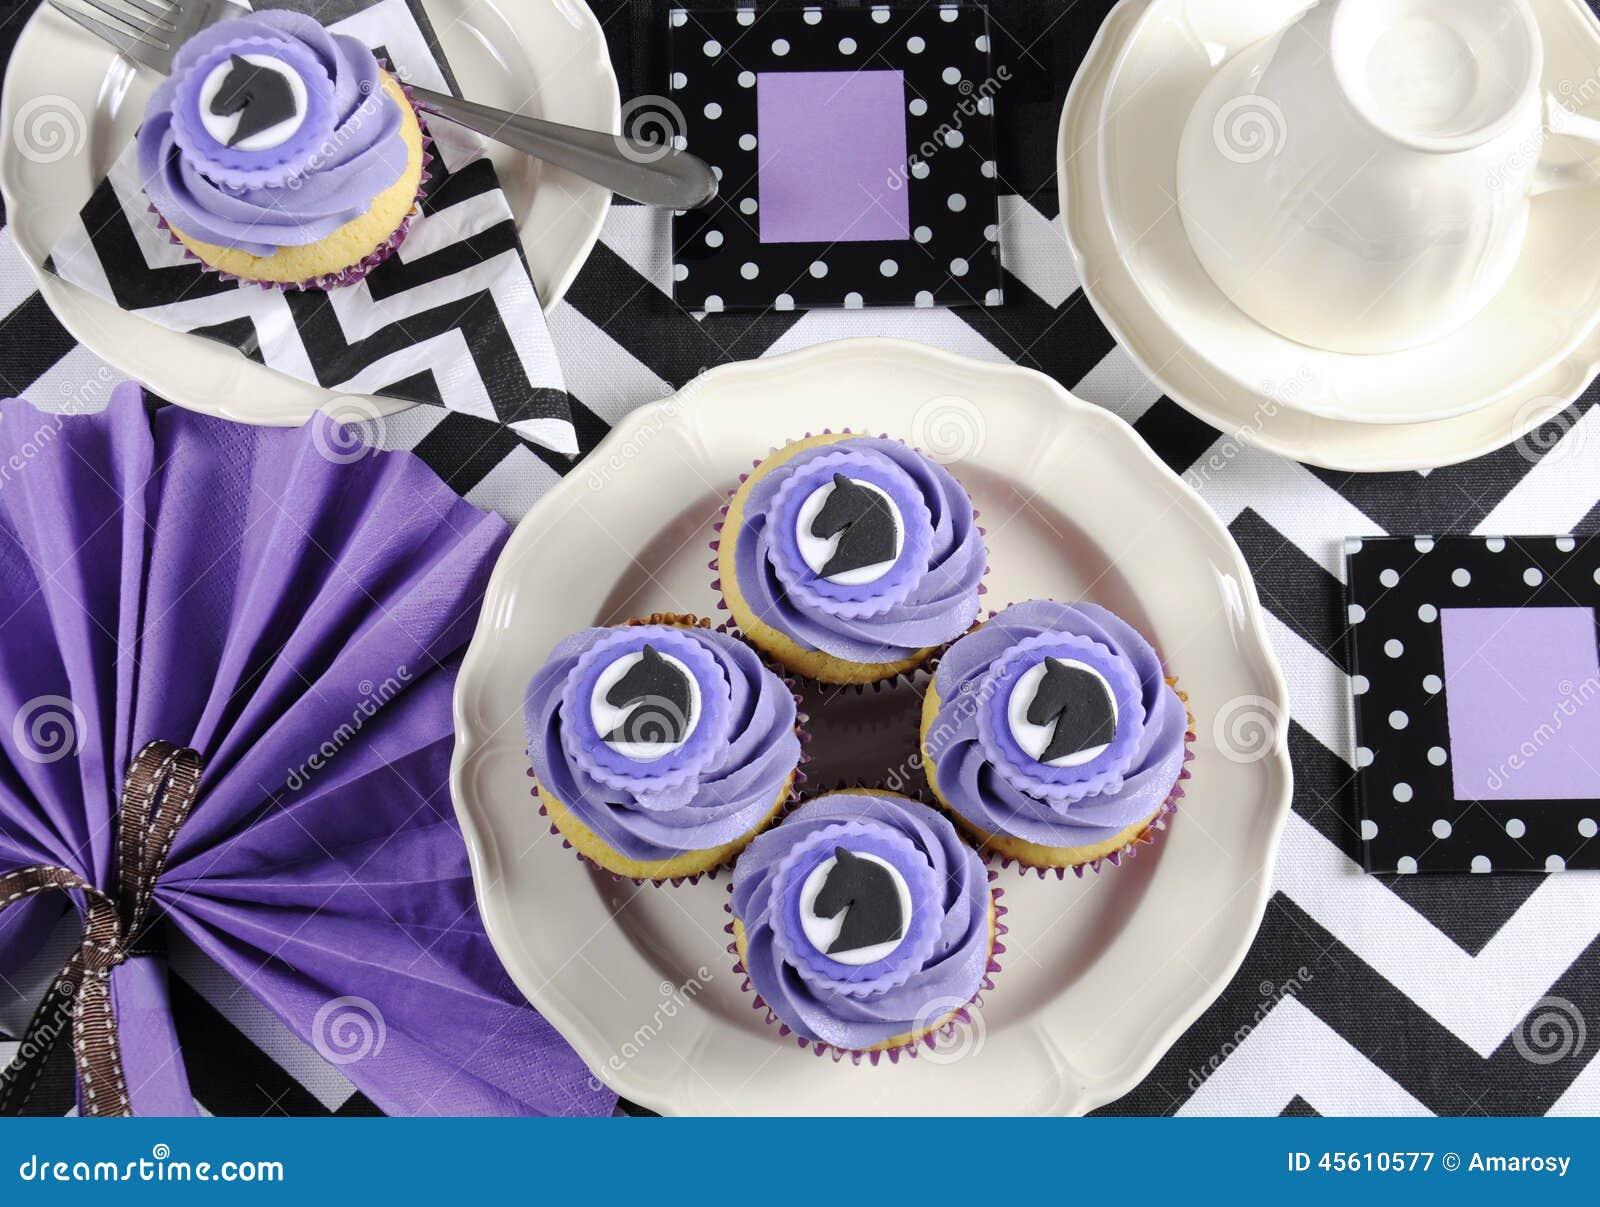 royaltyfree stock photo download black and white chevron with purple theme party